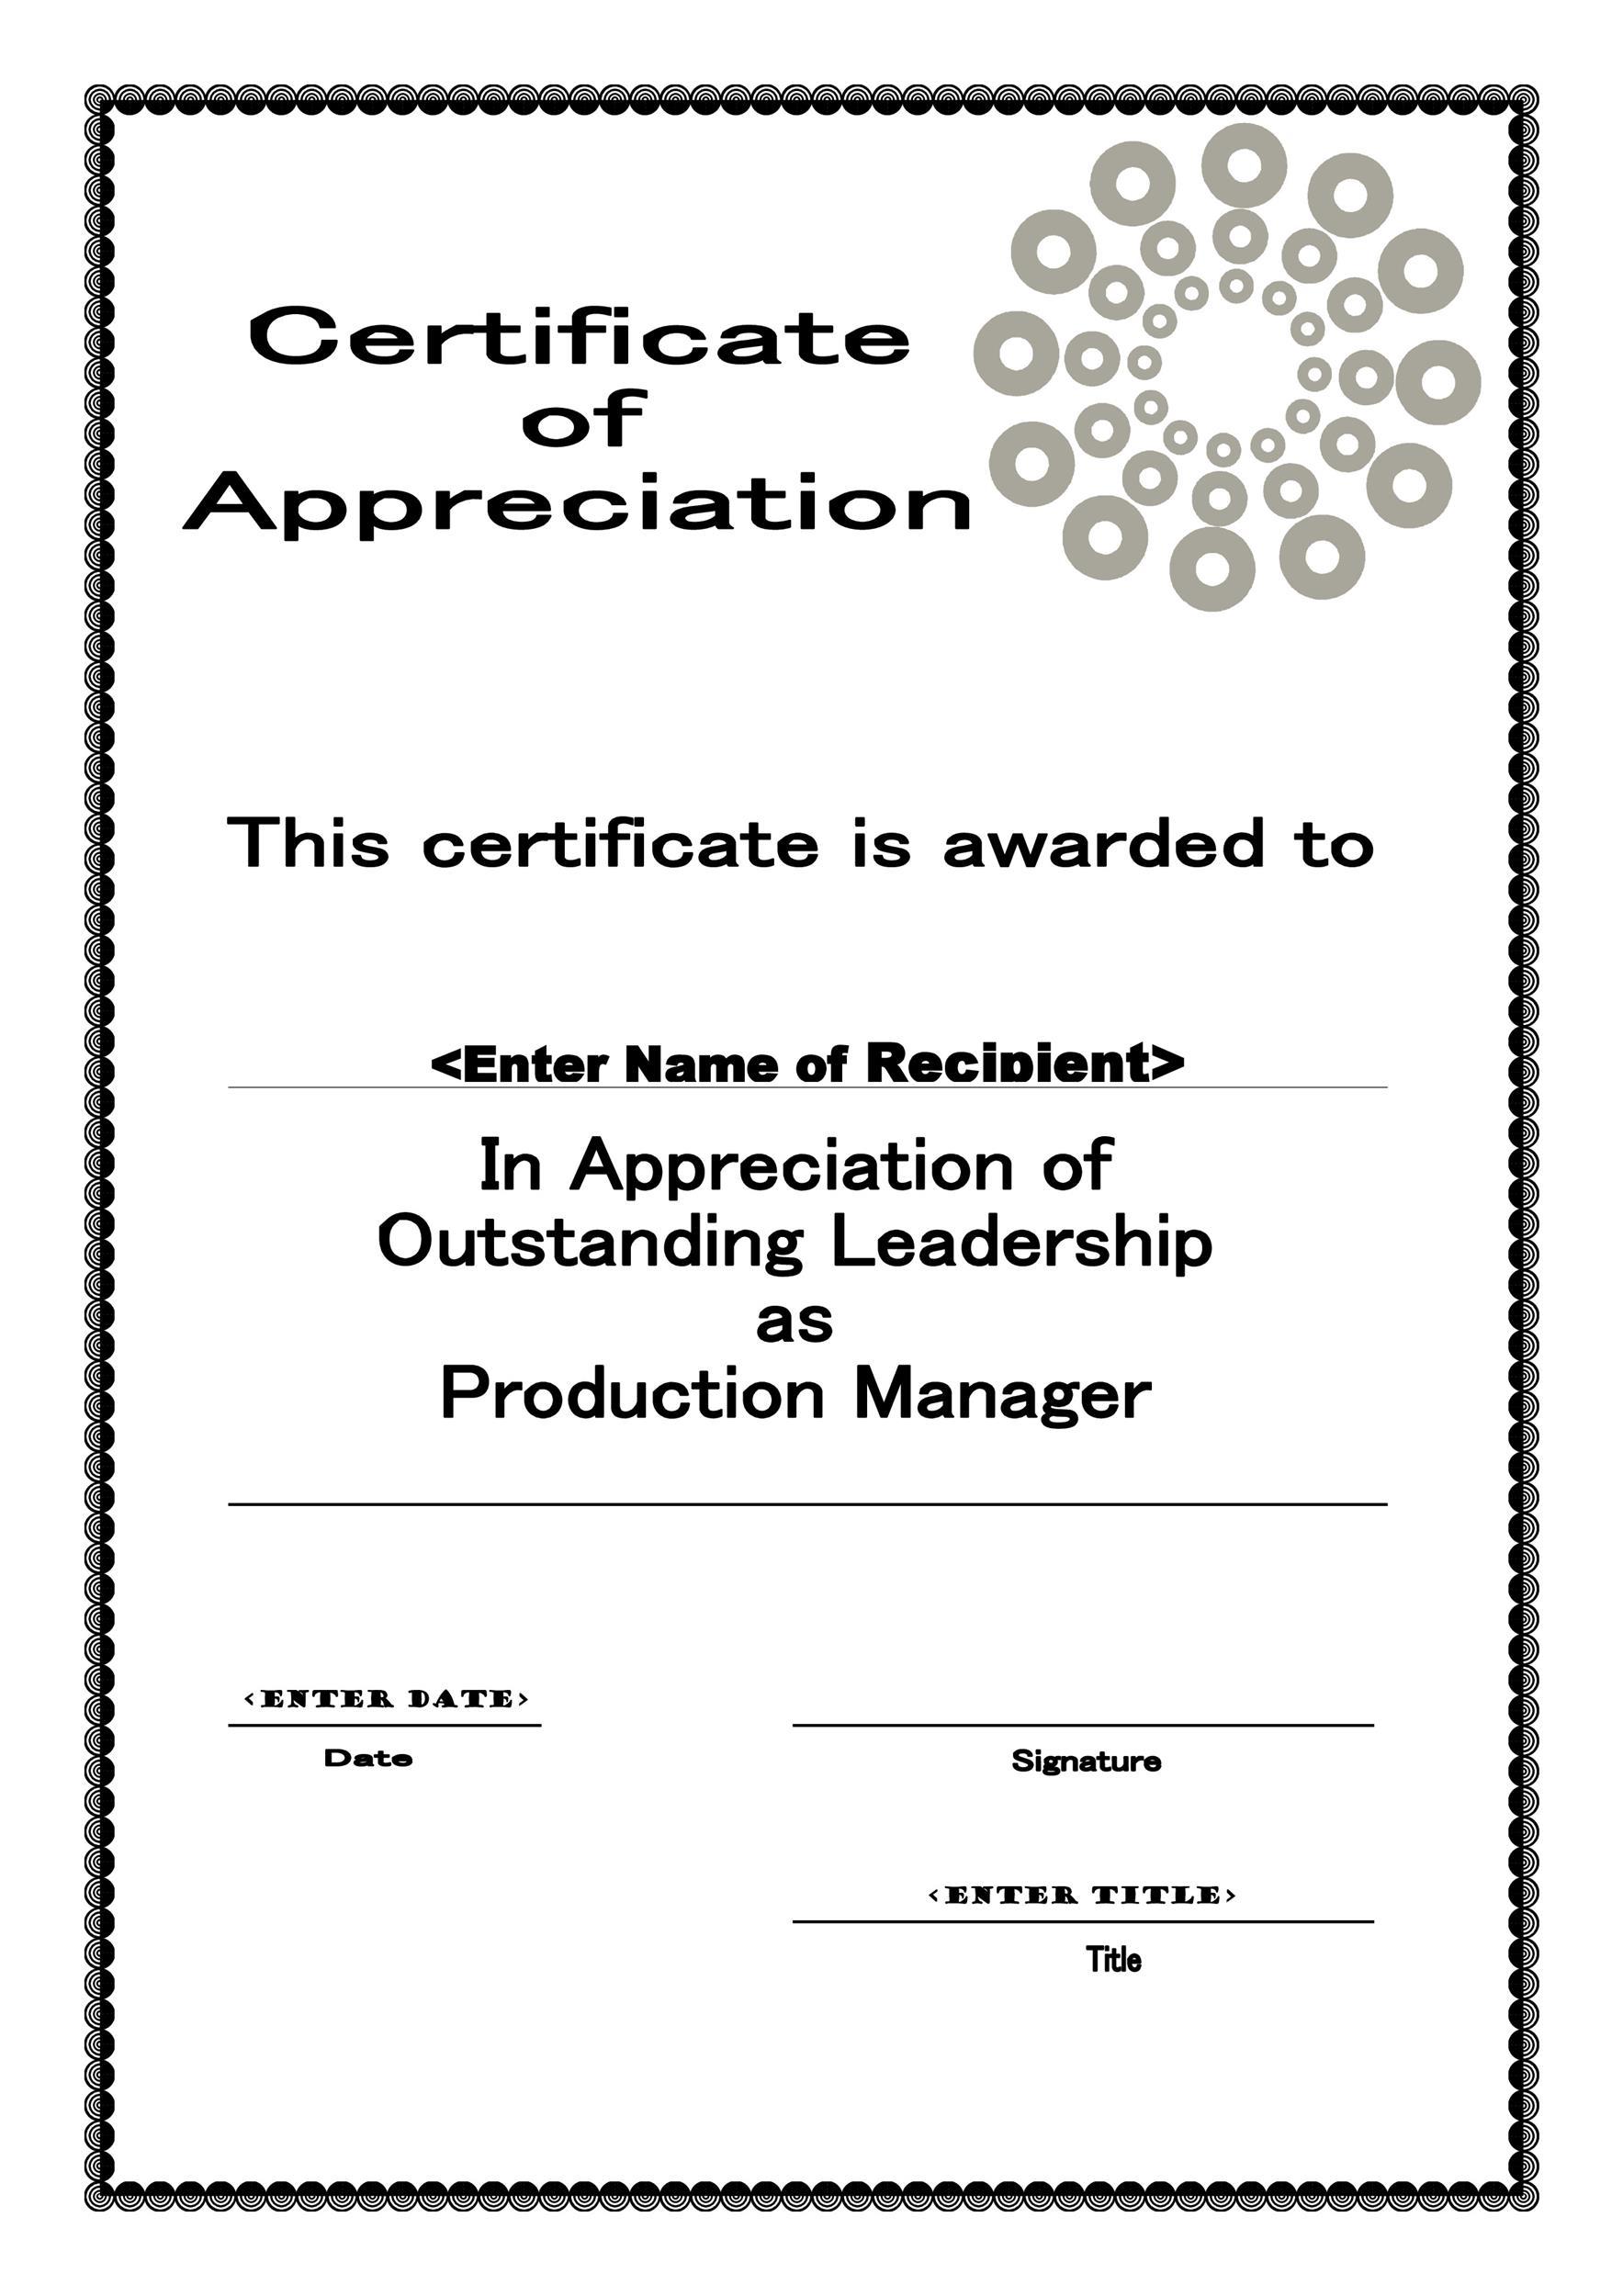 Free Certificate of Appreciation 11